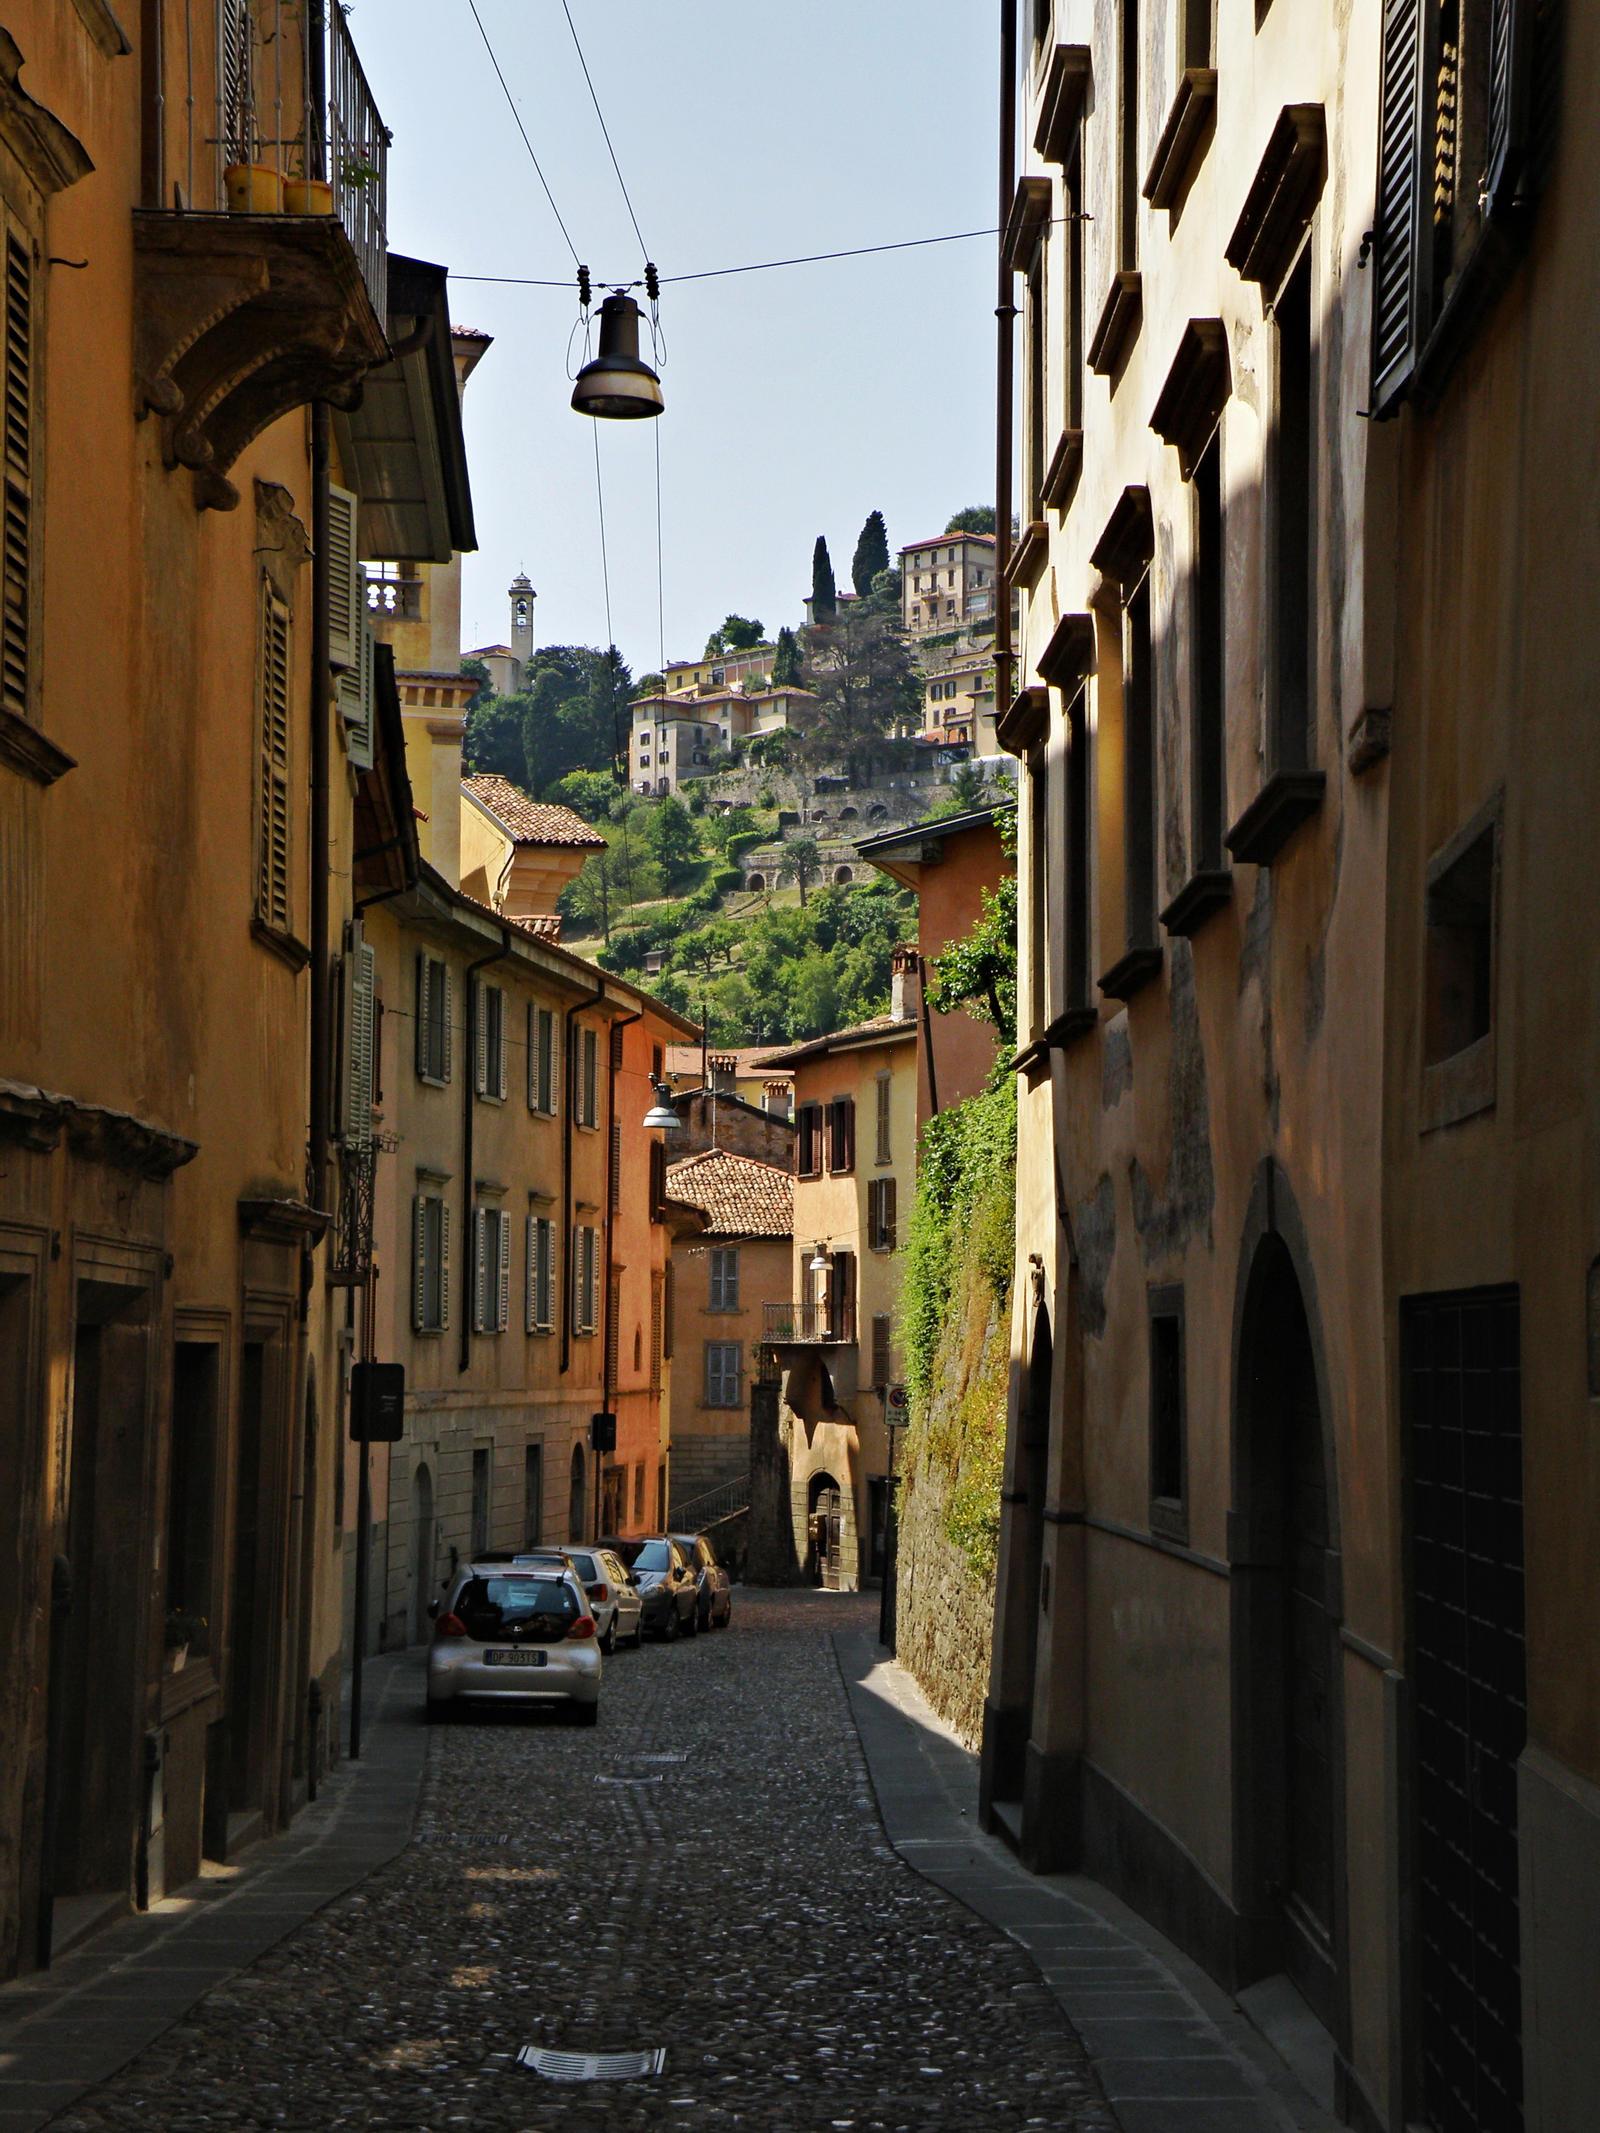 Narrow street by Sergiba on DeviantArt